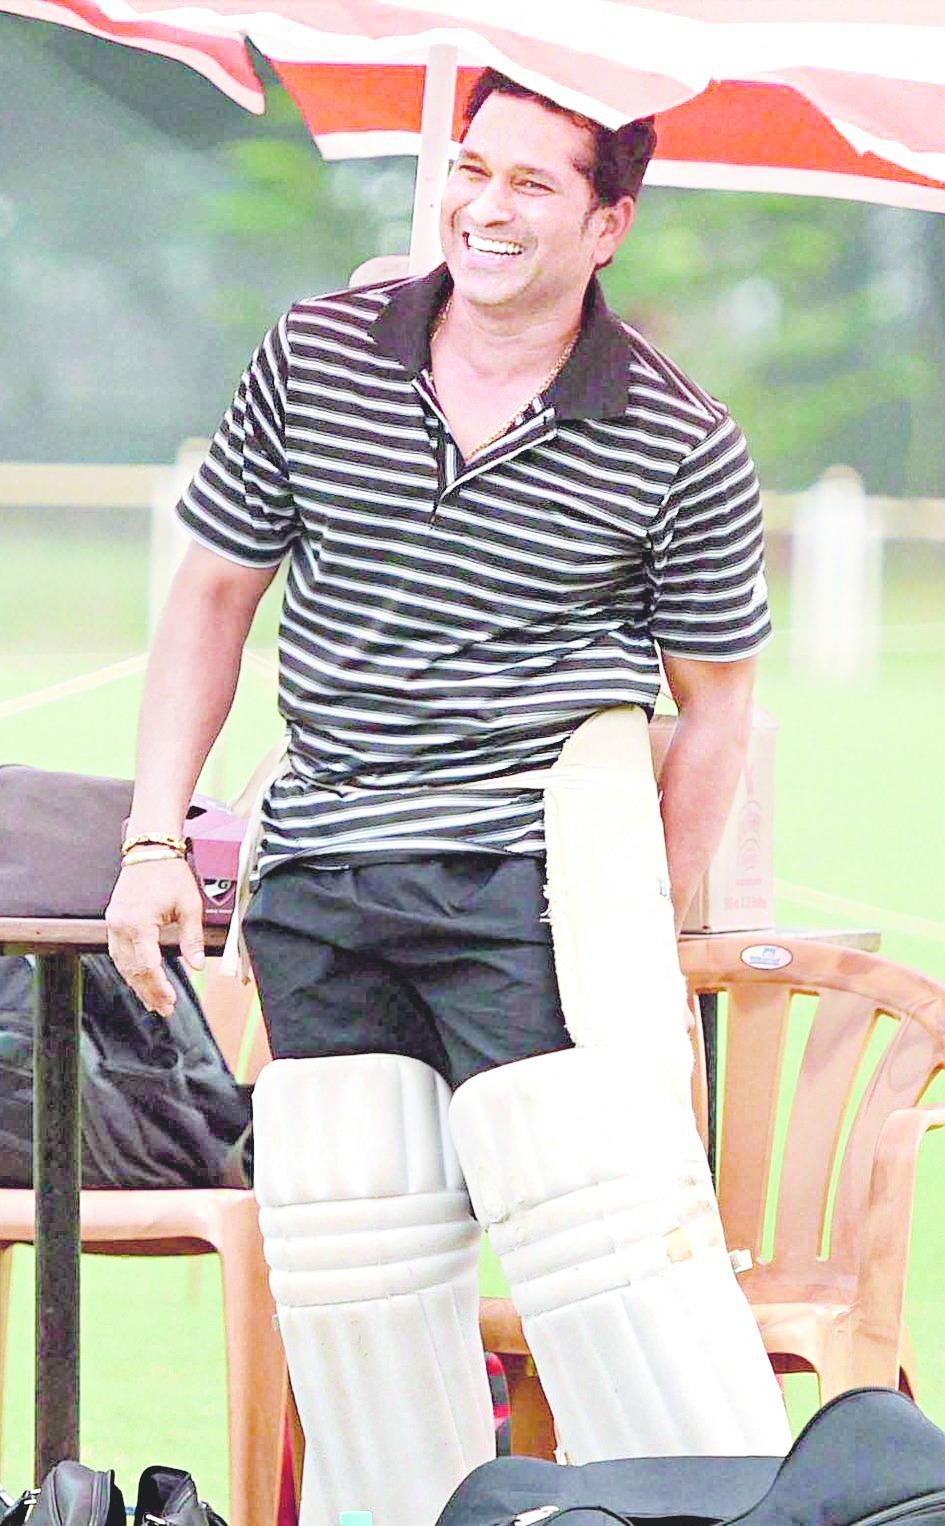 Sachin, Warne bat for cricket in Olympics - Telegraph India